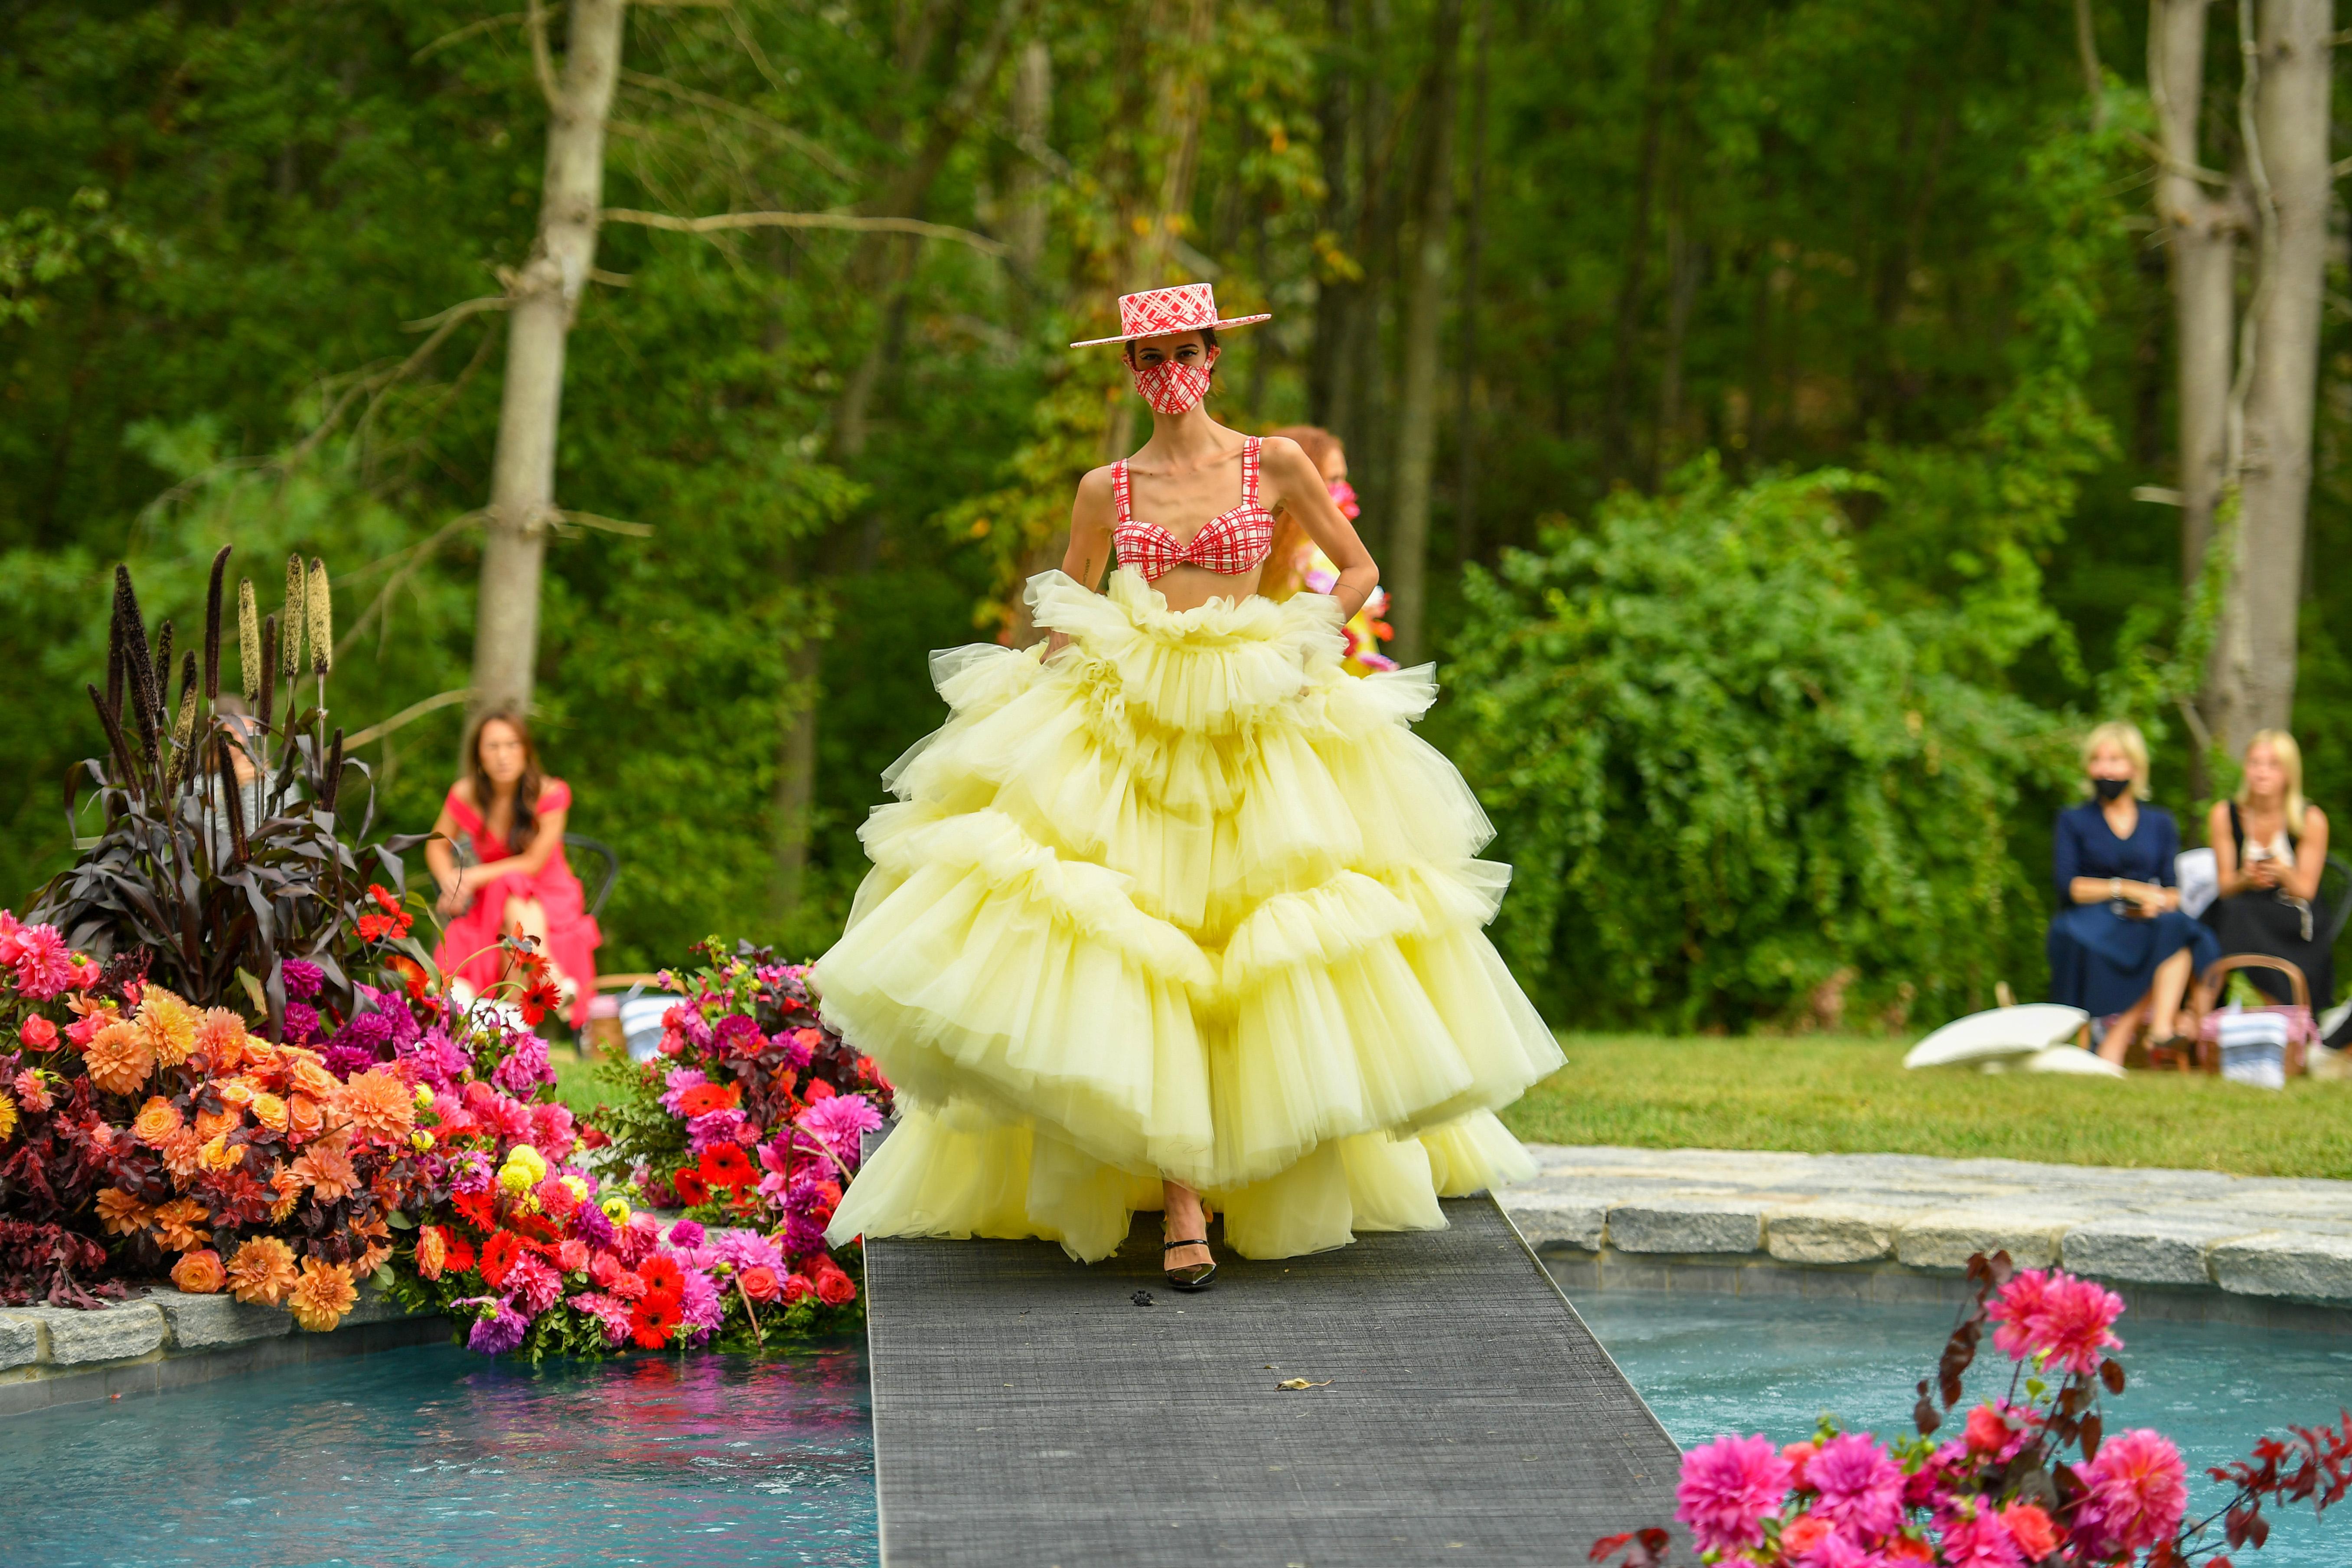 Designers like Christian Siriano made New York fashion week happen